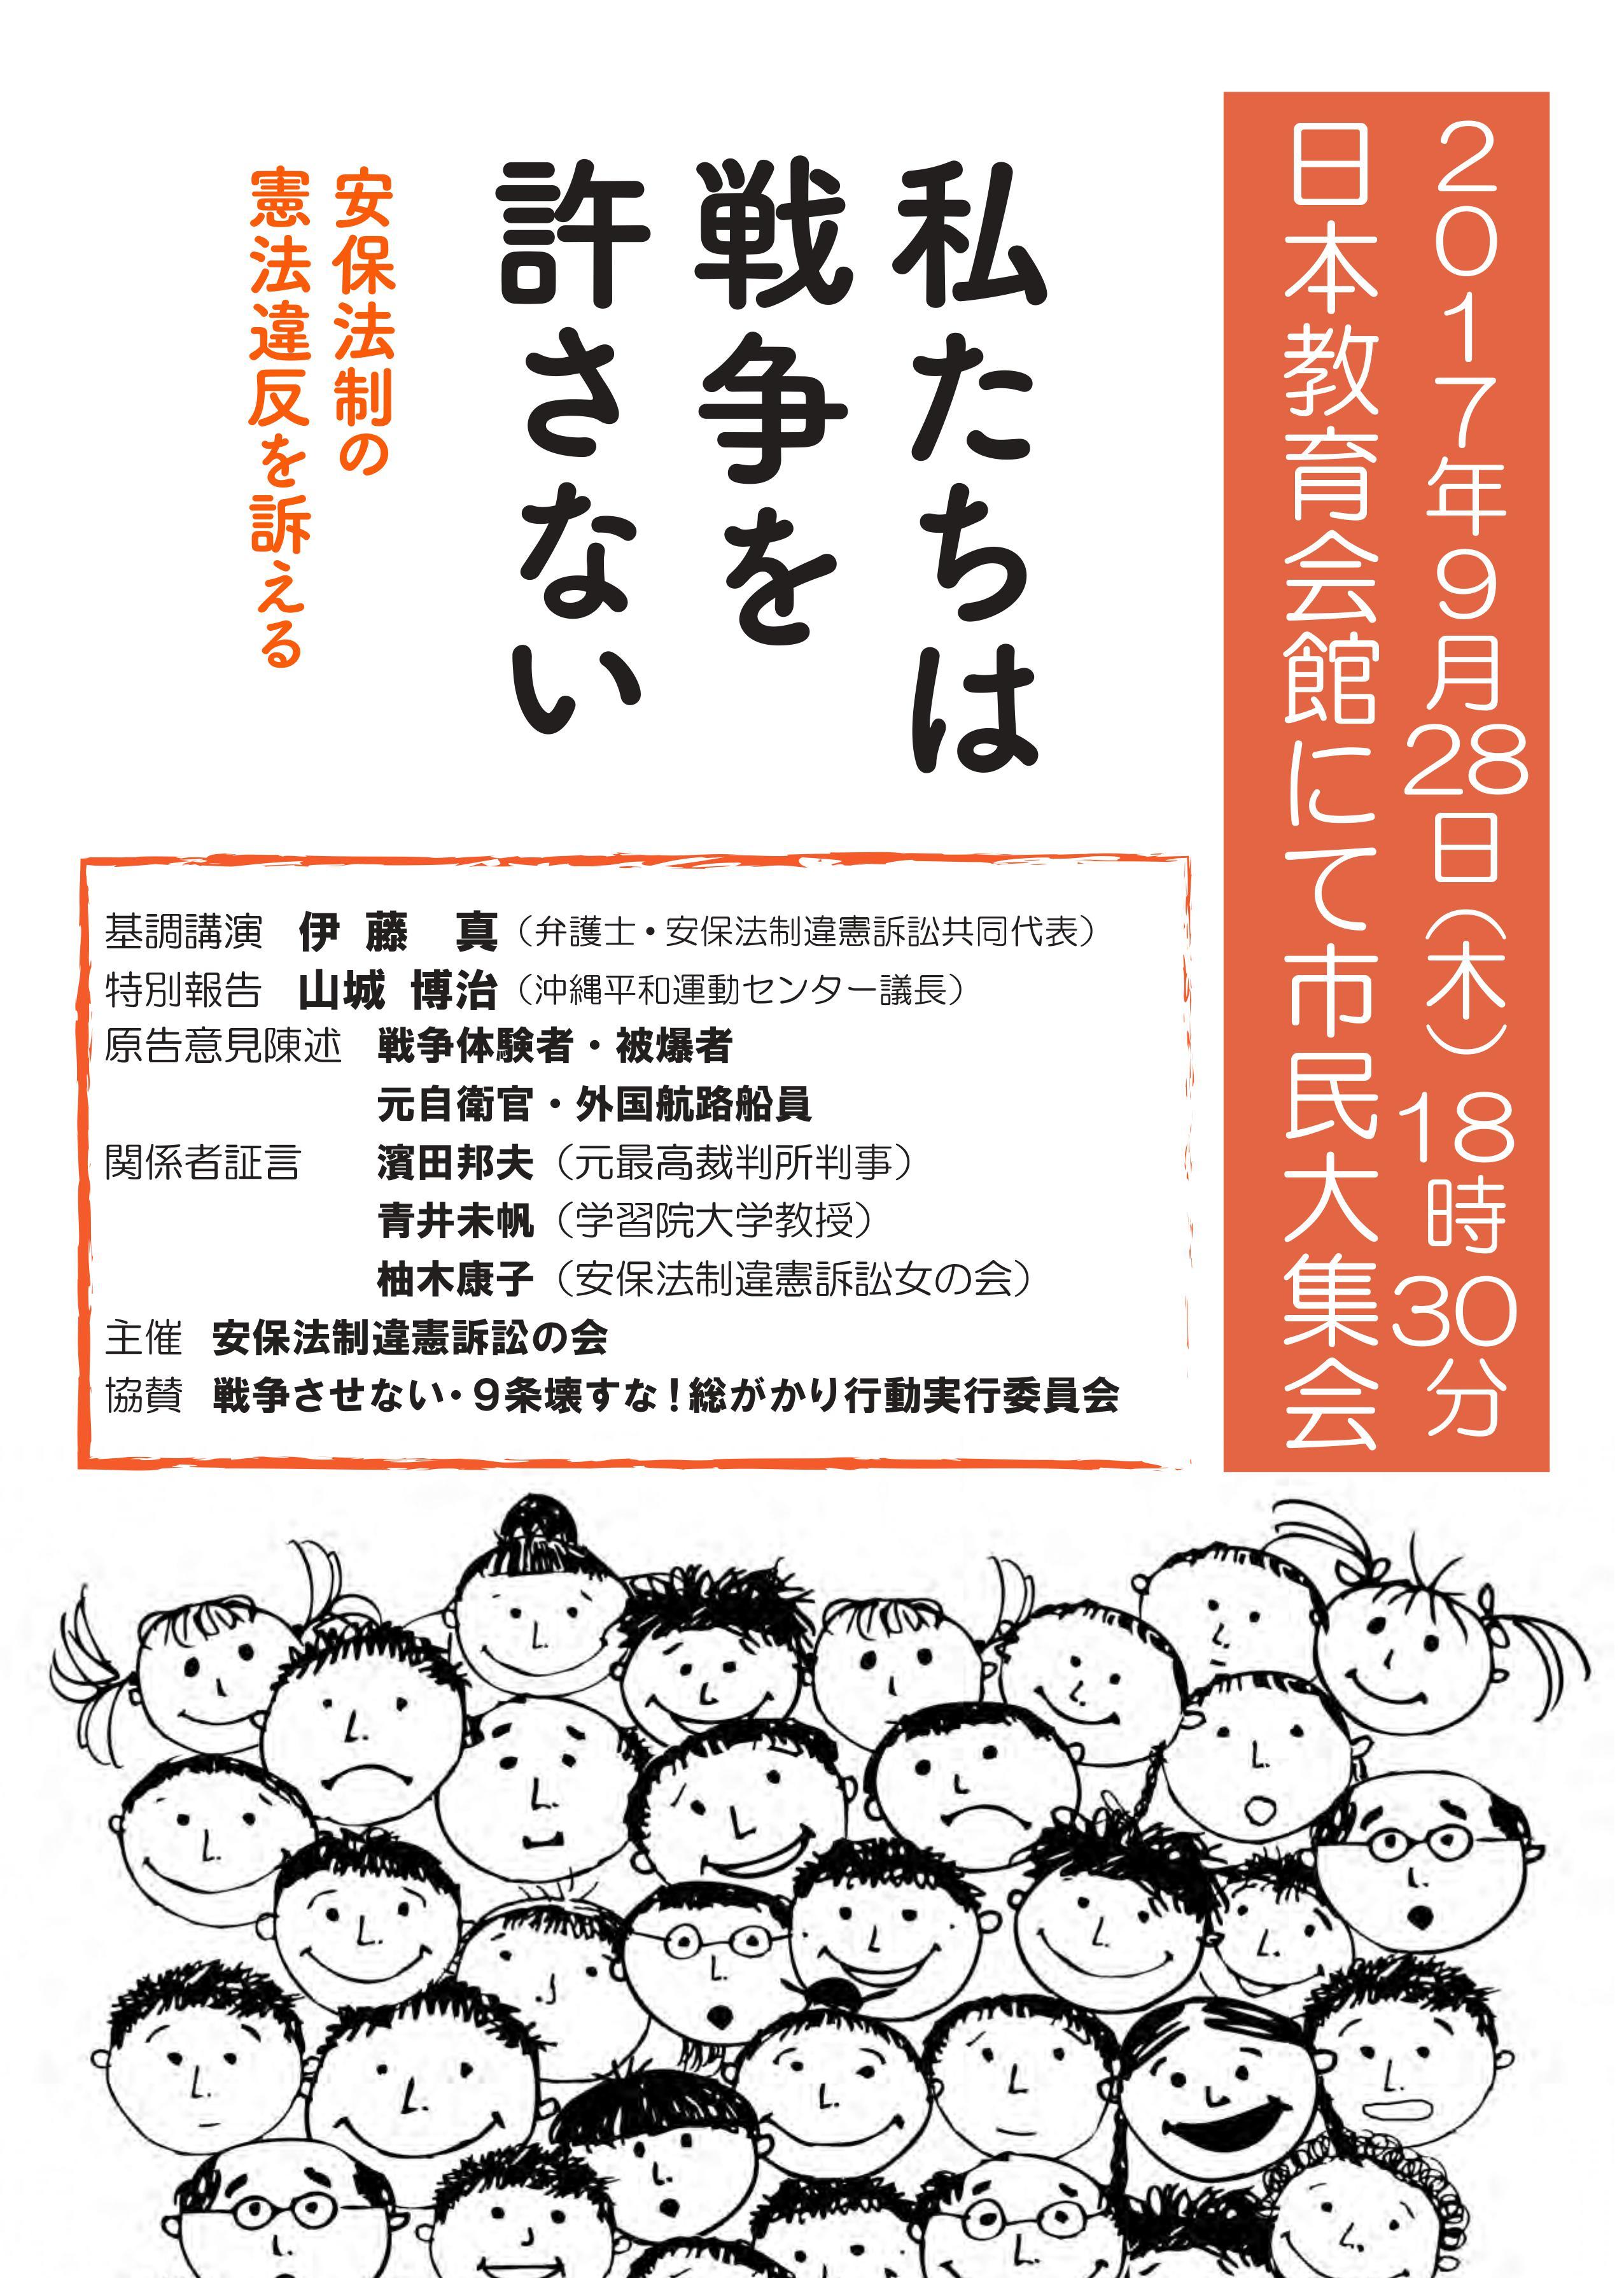 From chieko.oyama at gmail.com...